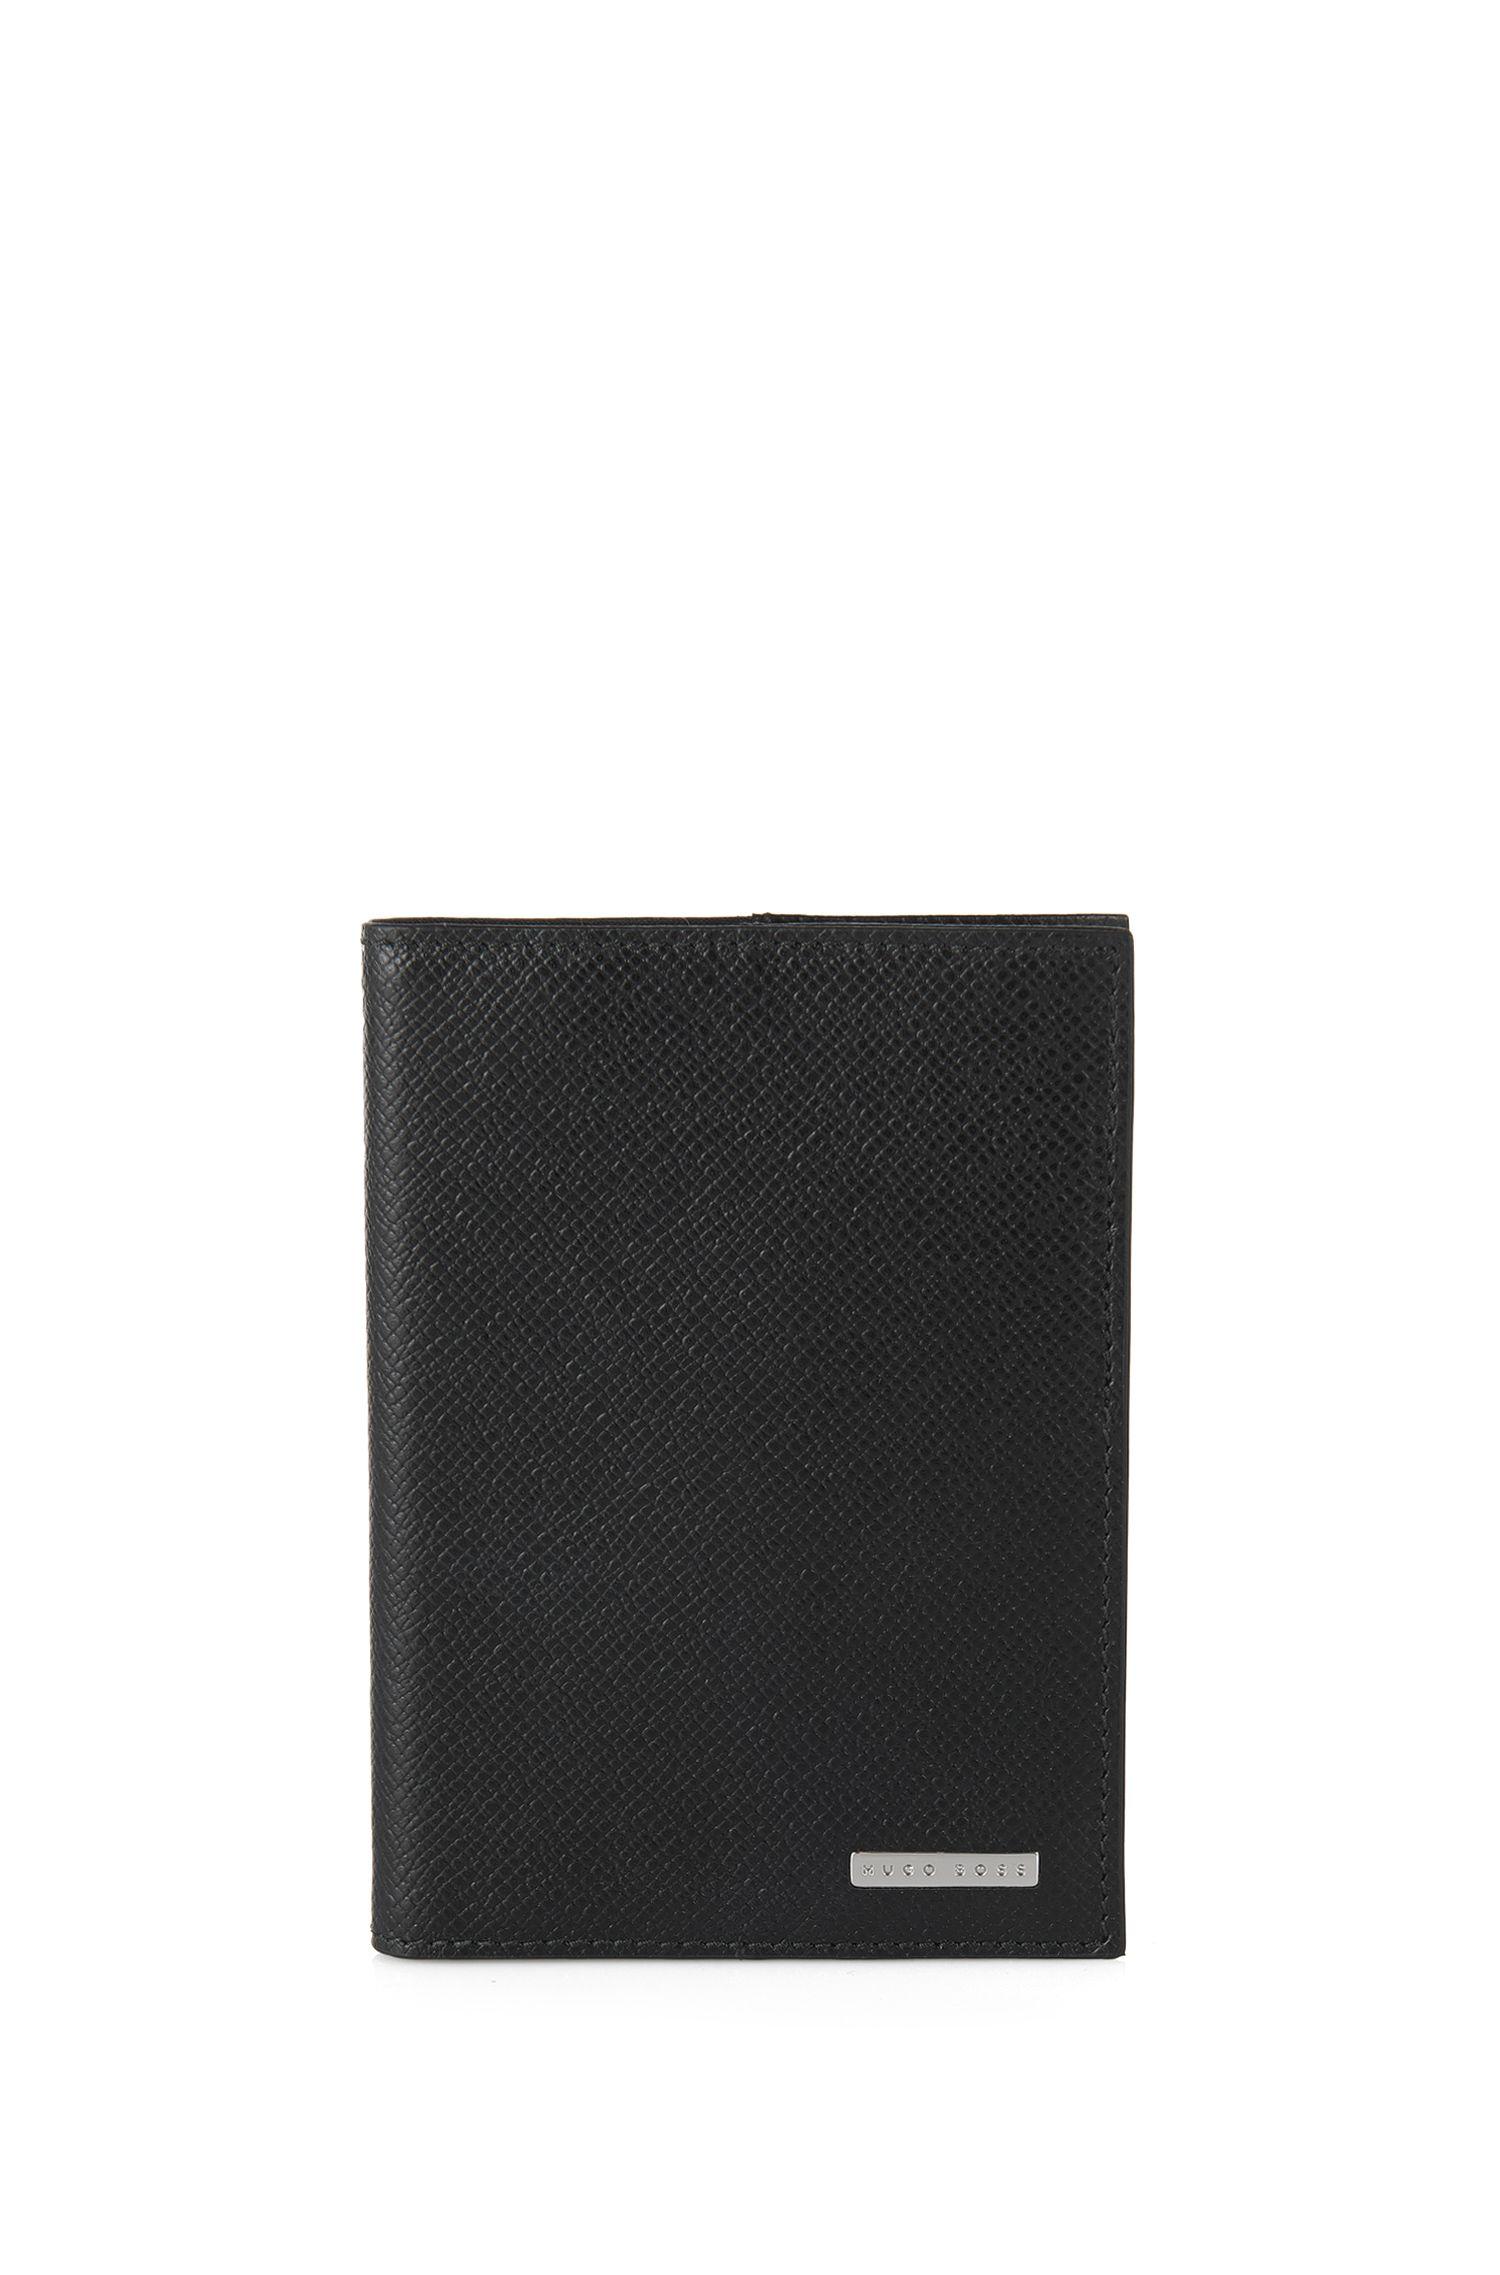 BOSS Signature Collection passport holder in palmellato leather